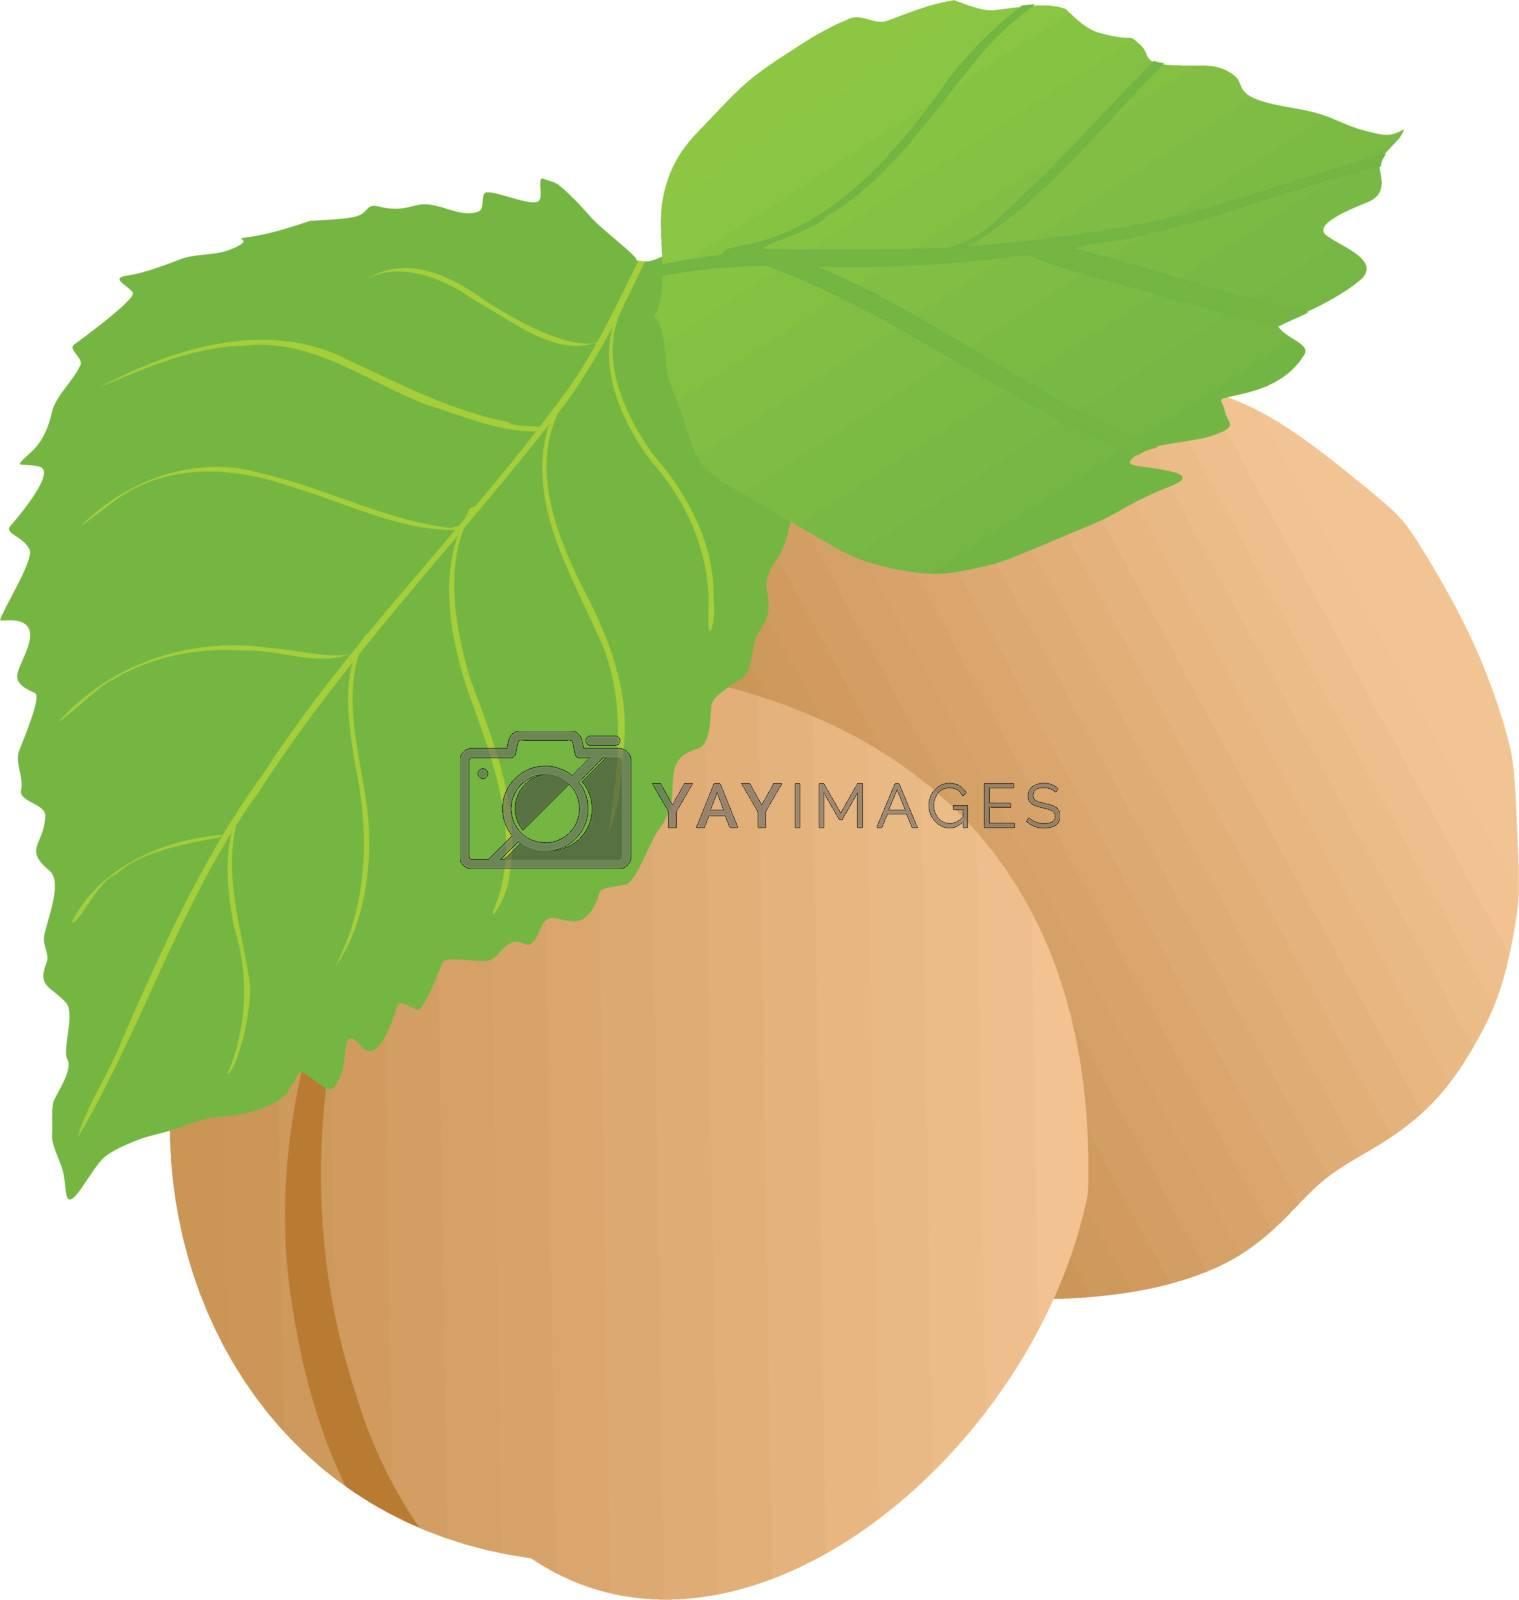 Couple of apricot